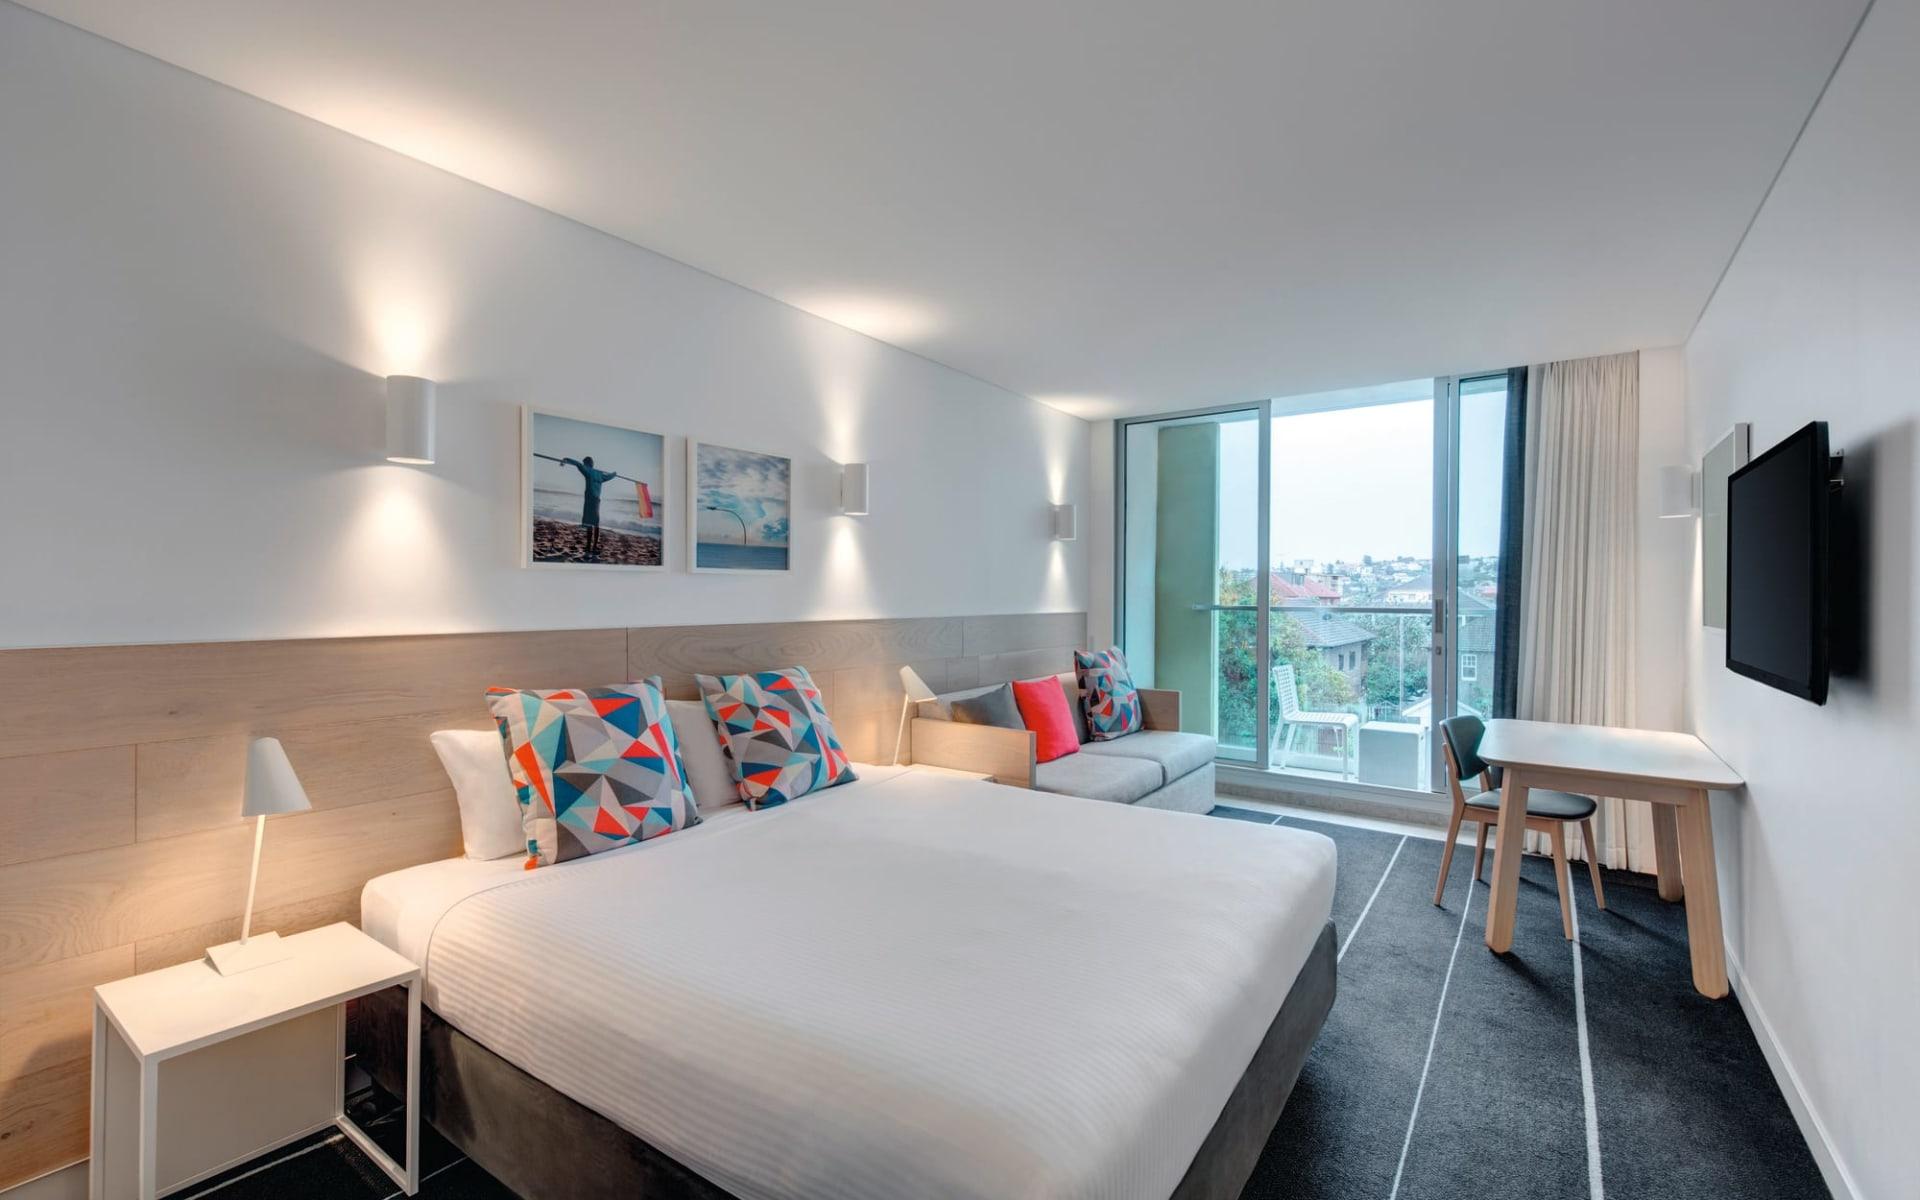 Adina Apartment Hotel Bondi Beach in Sydney - Bondi Beach: Adina Apartment Hotel Bondi Beach - Studio 2017